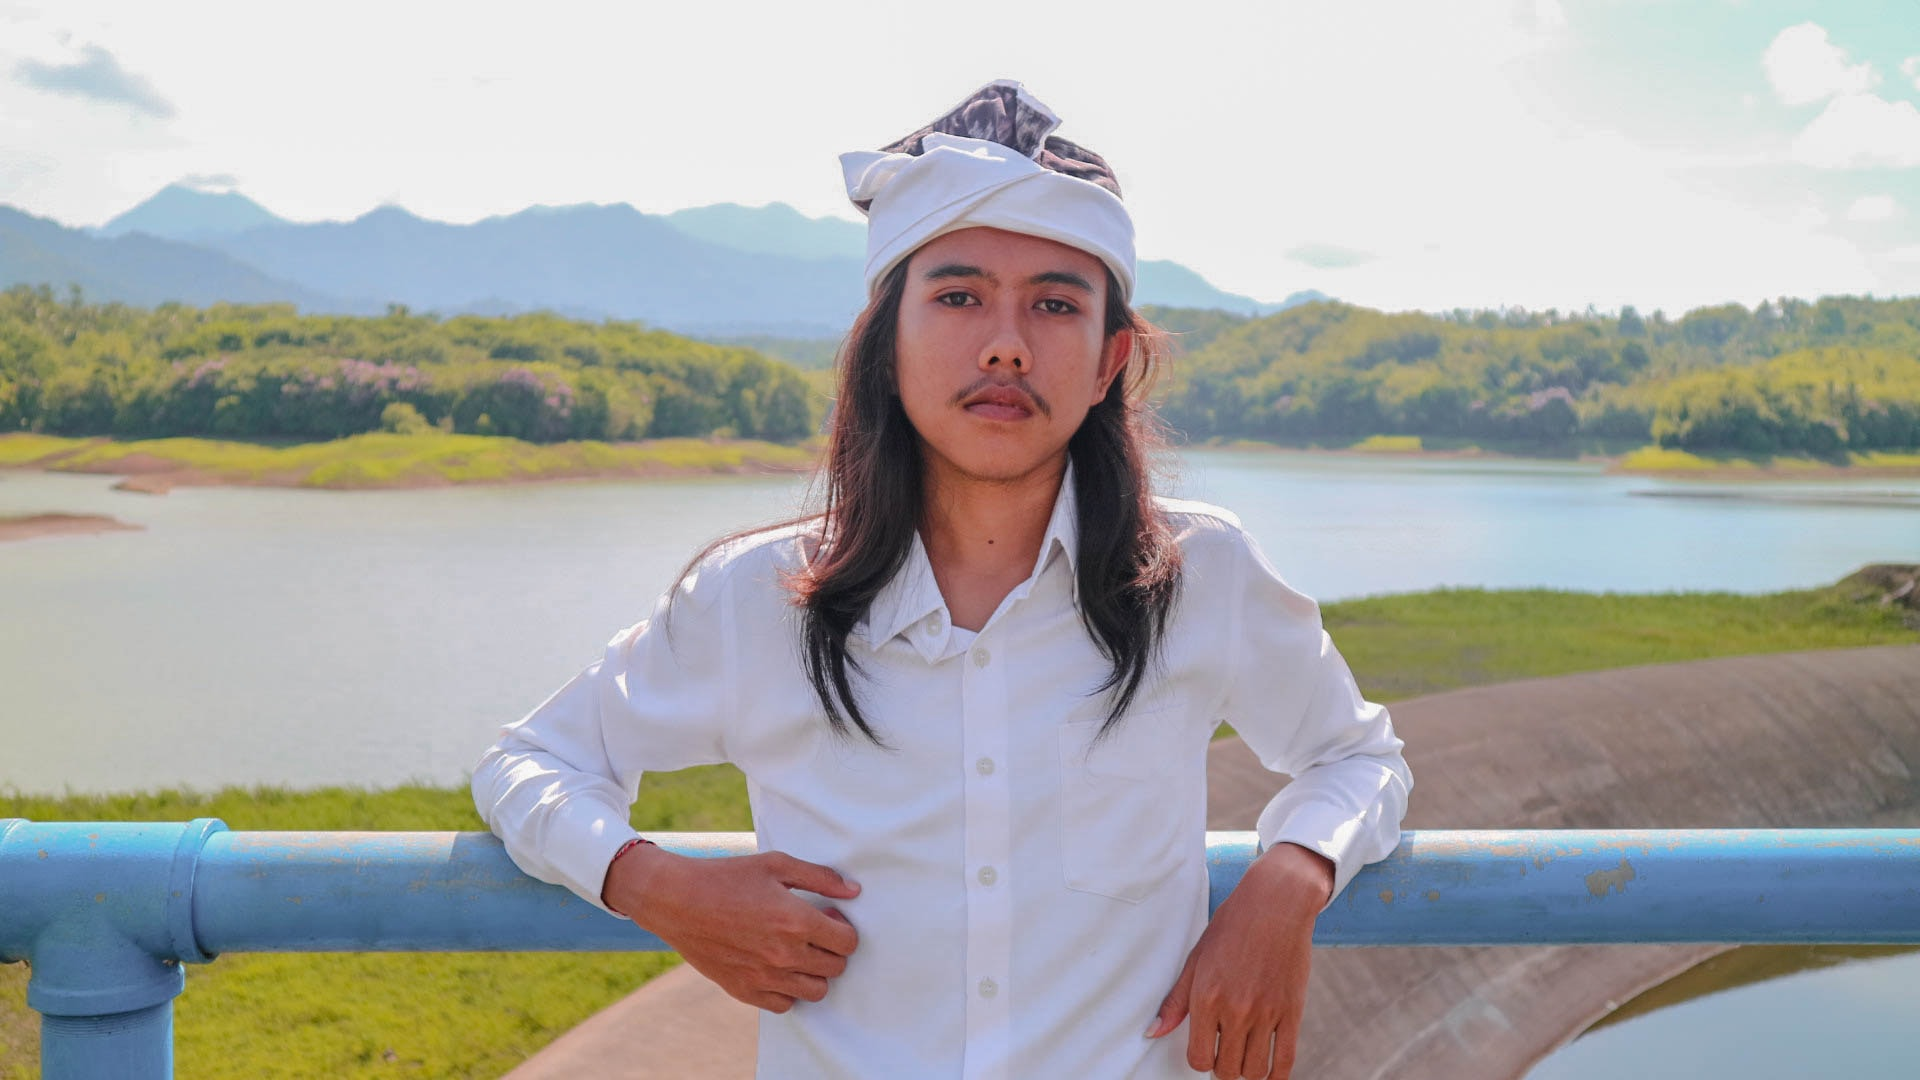 Go to Kadek Ari Pranata's profile